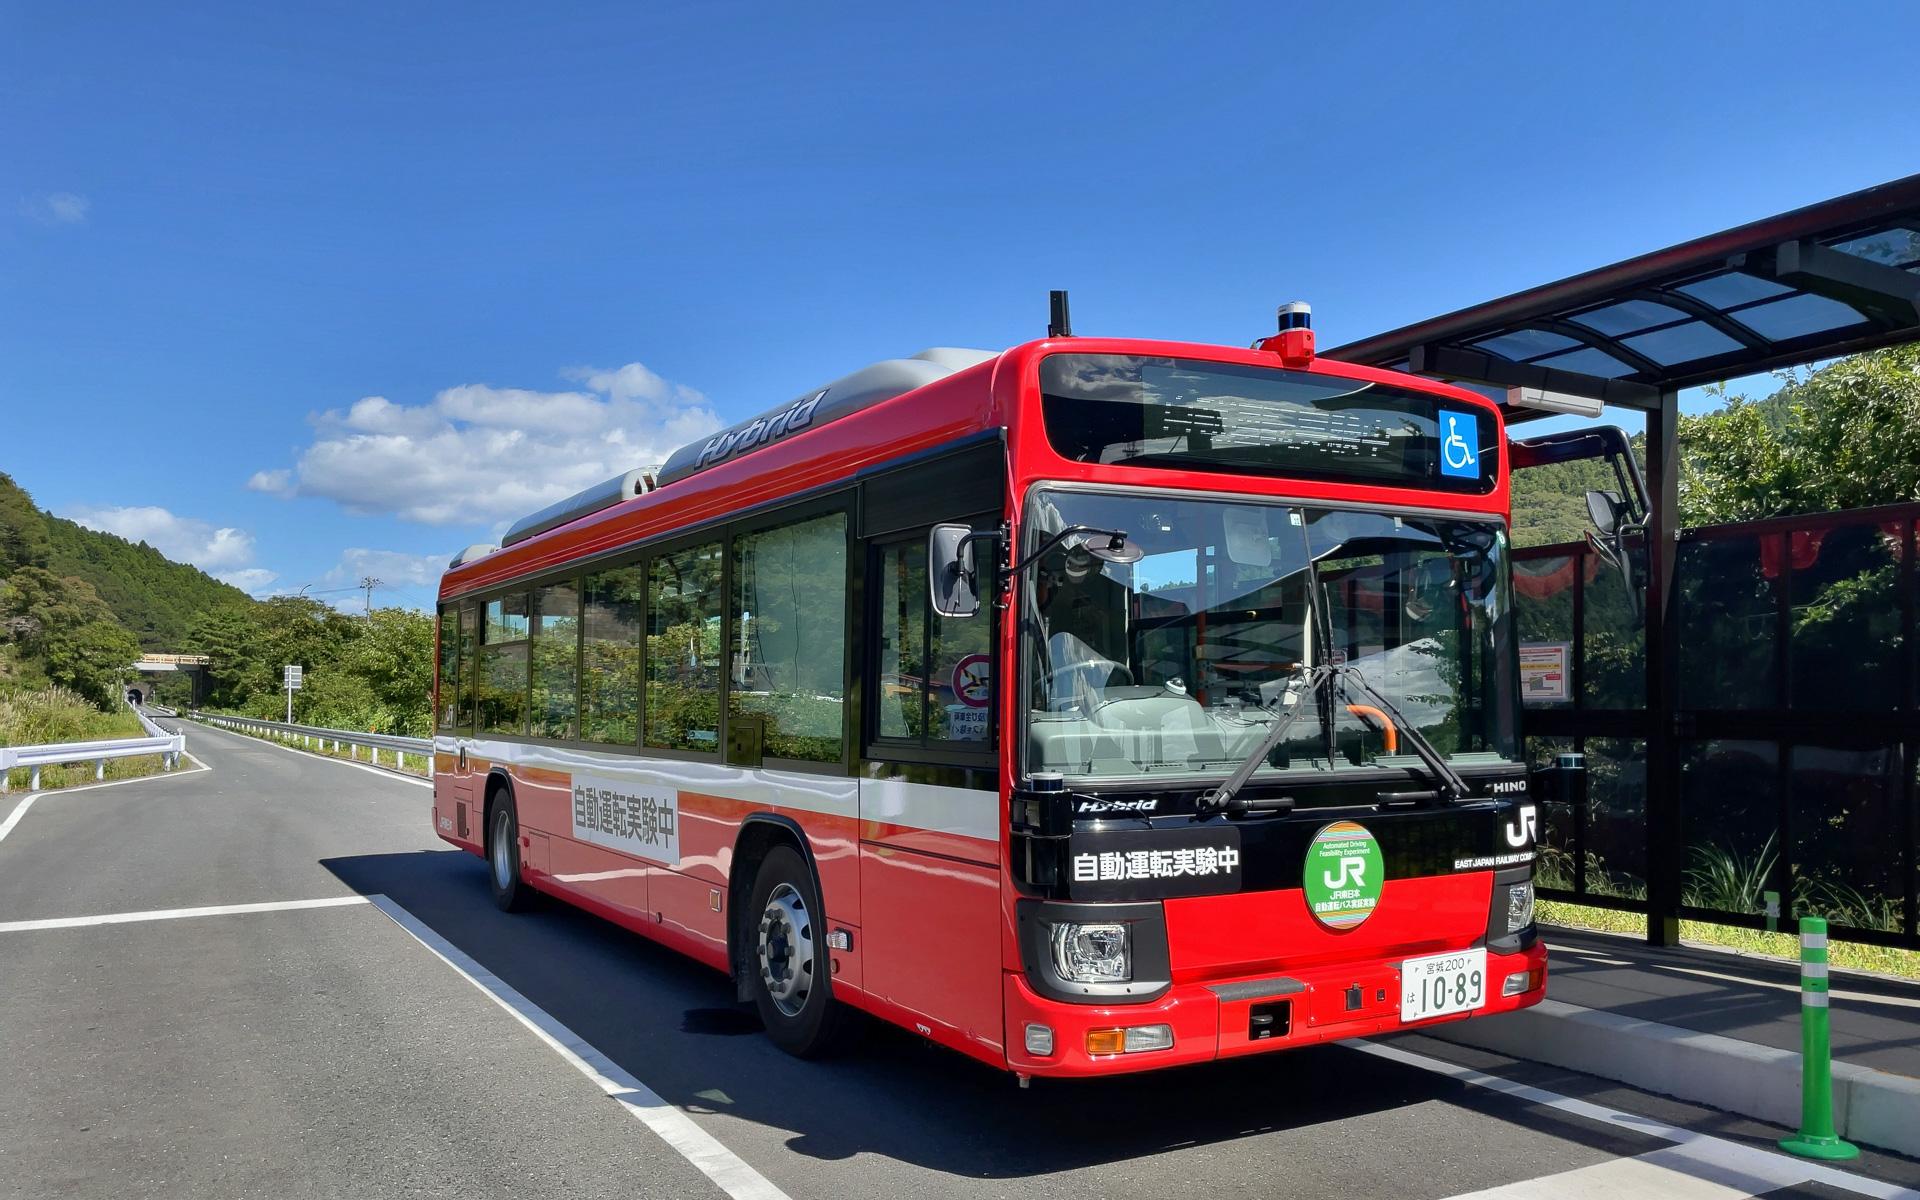 JR東日本が実証実験を行なっている自動運転バス。JR東日本が購入して、独自に改造を行なっている